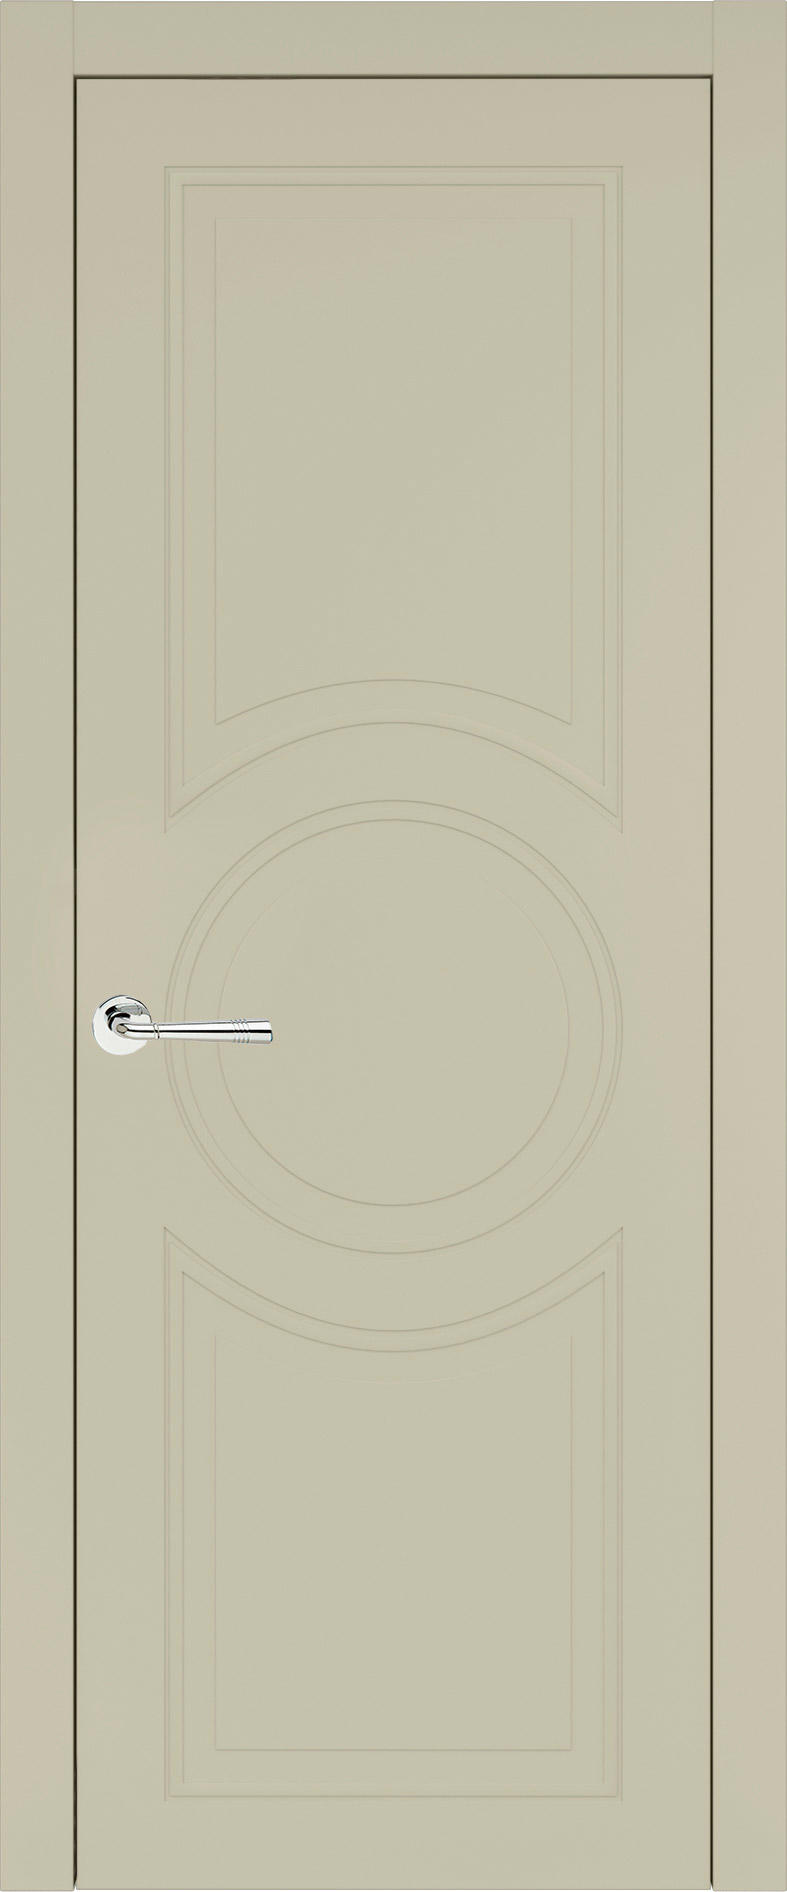 Ravenna Neo Classic цвет - Серо-оливковая эмаль (RAL 7032) Без стекла (ДГ)